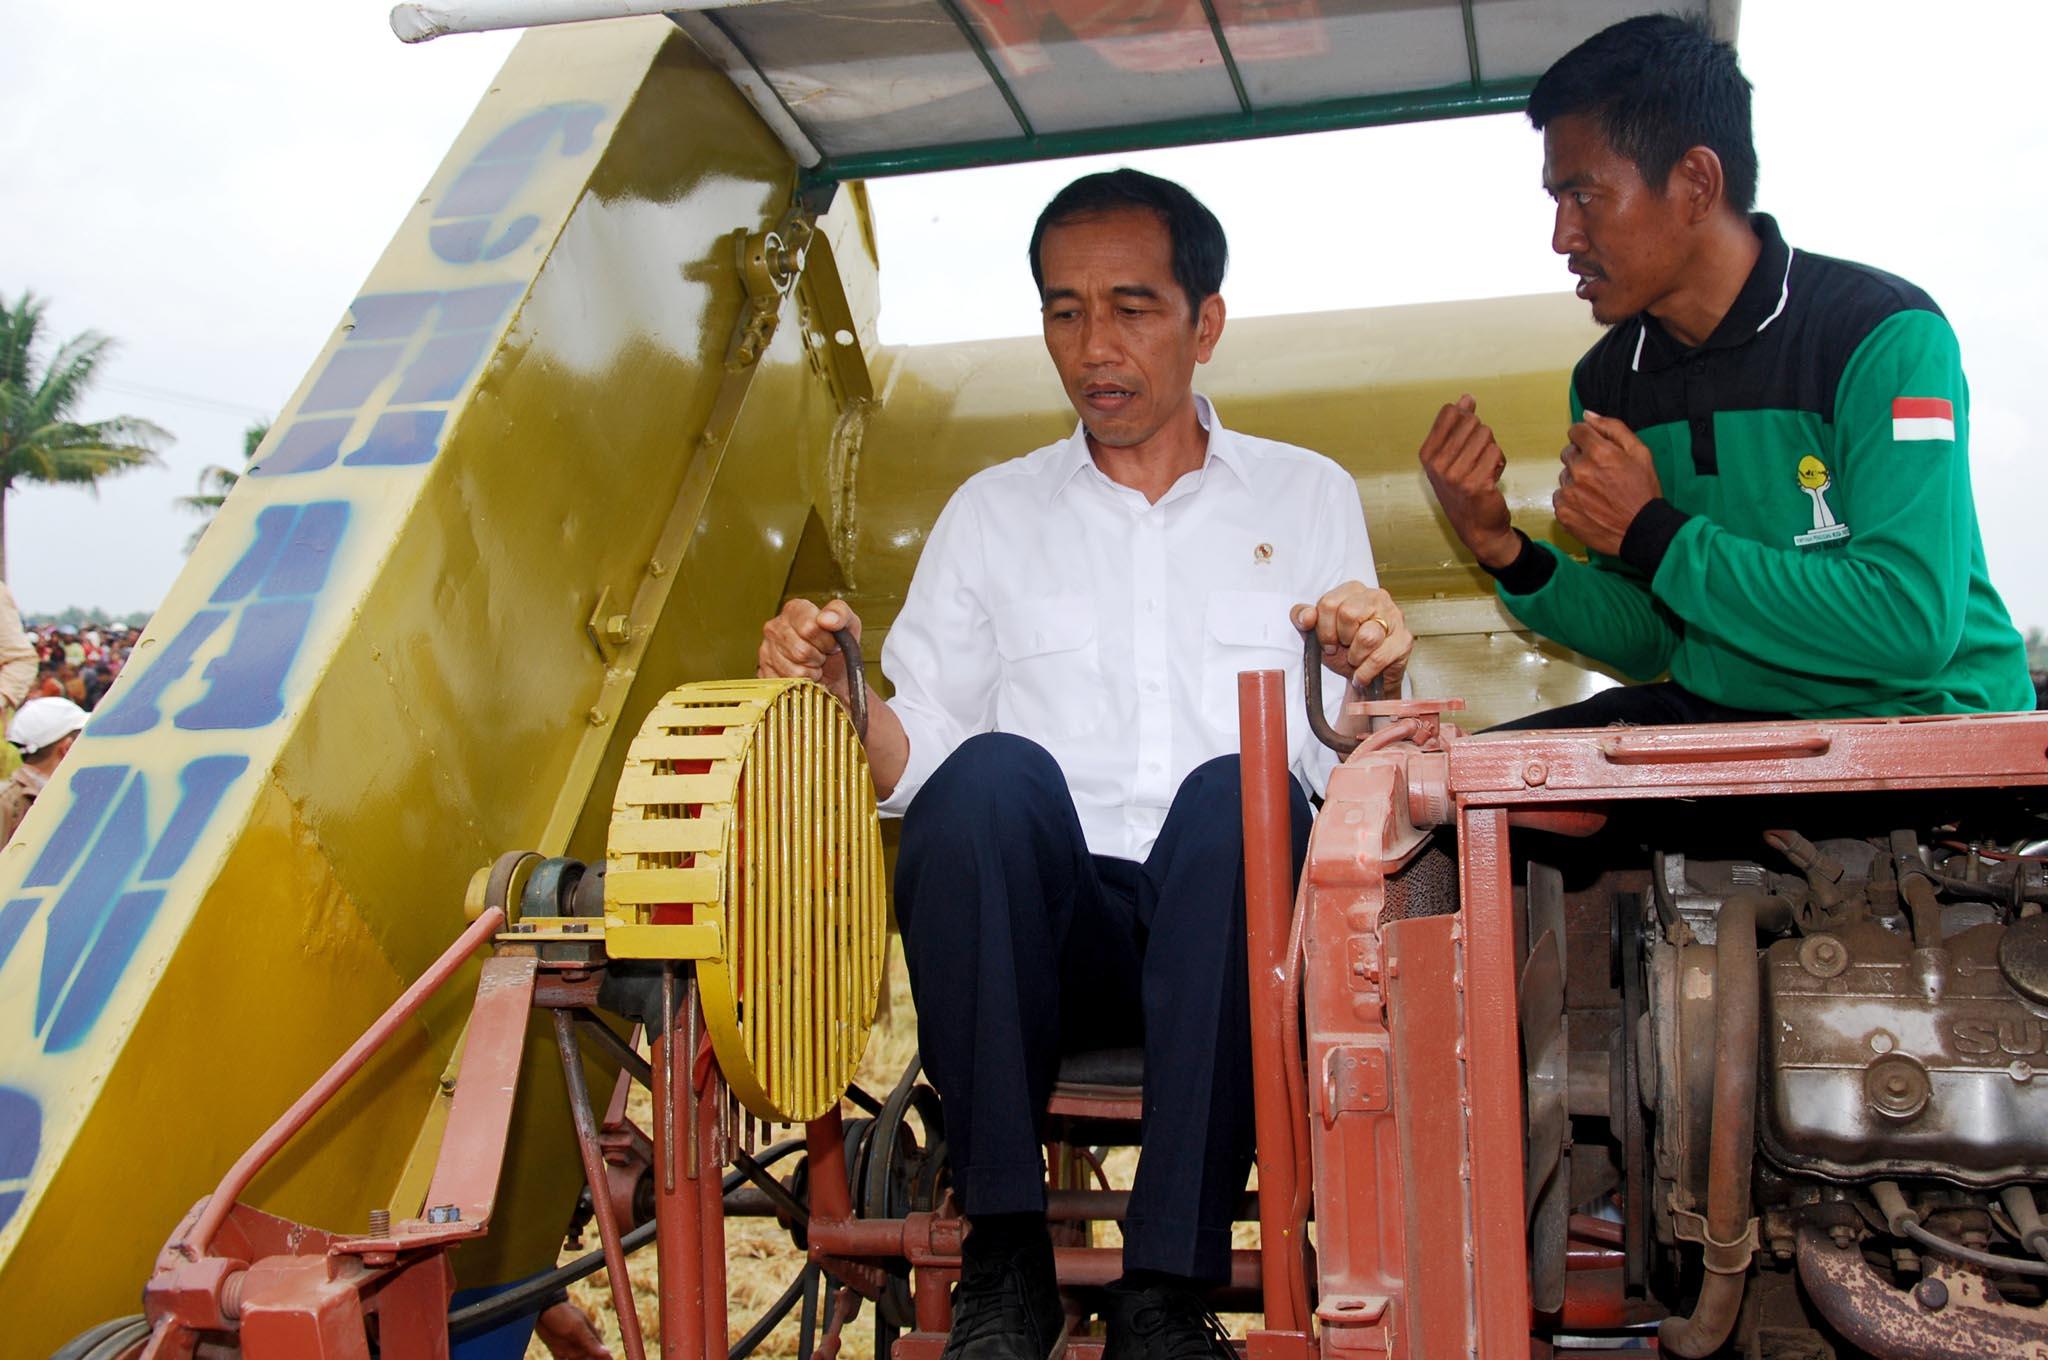 14-11-05_Presiden Jokowi Mencoba Mesin Pemanen Padi Inovasi Lokal-5-s